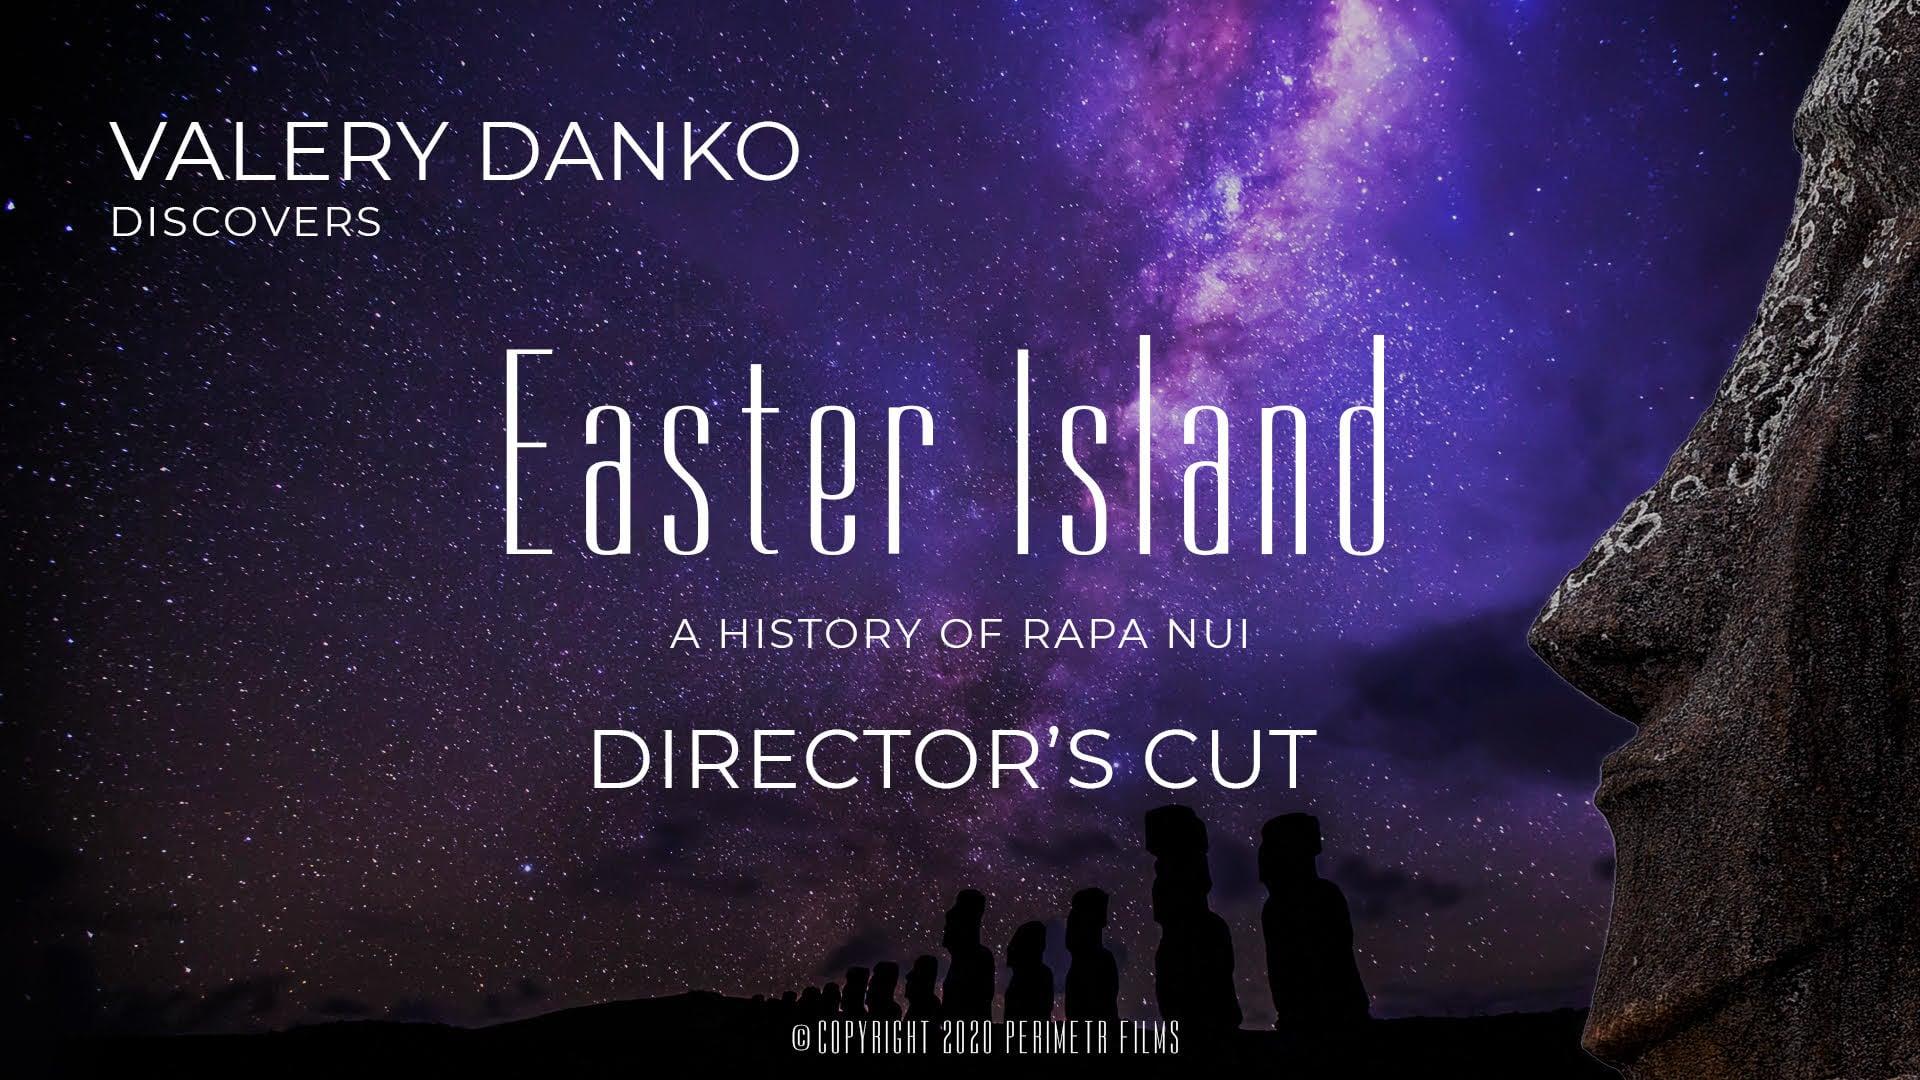 Trailer - Valery Danko Discovers Easter Island